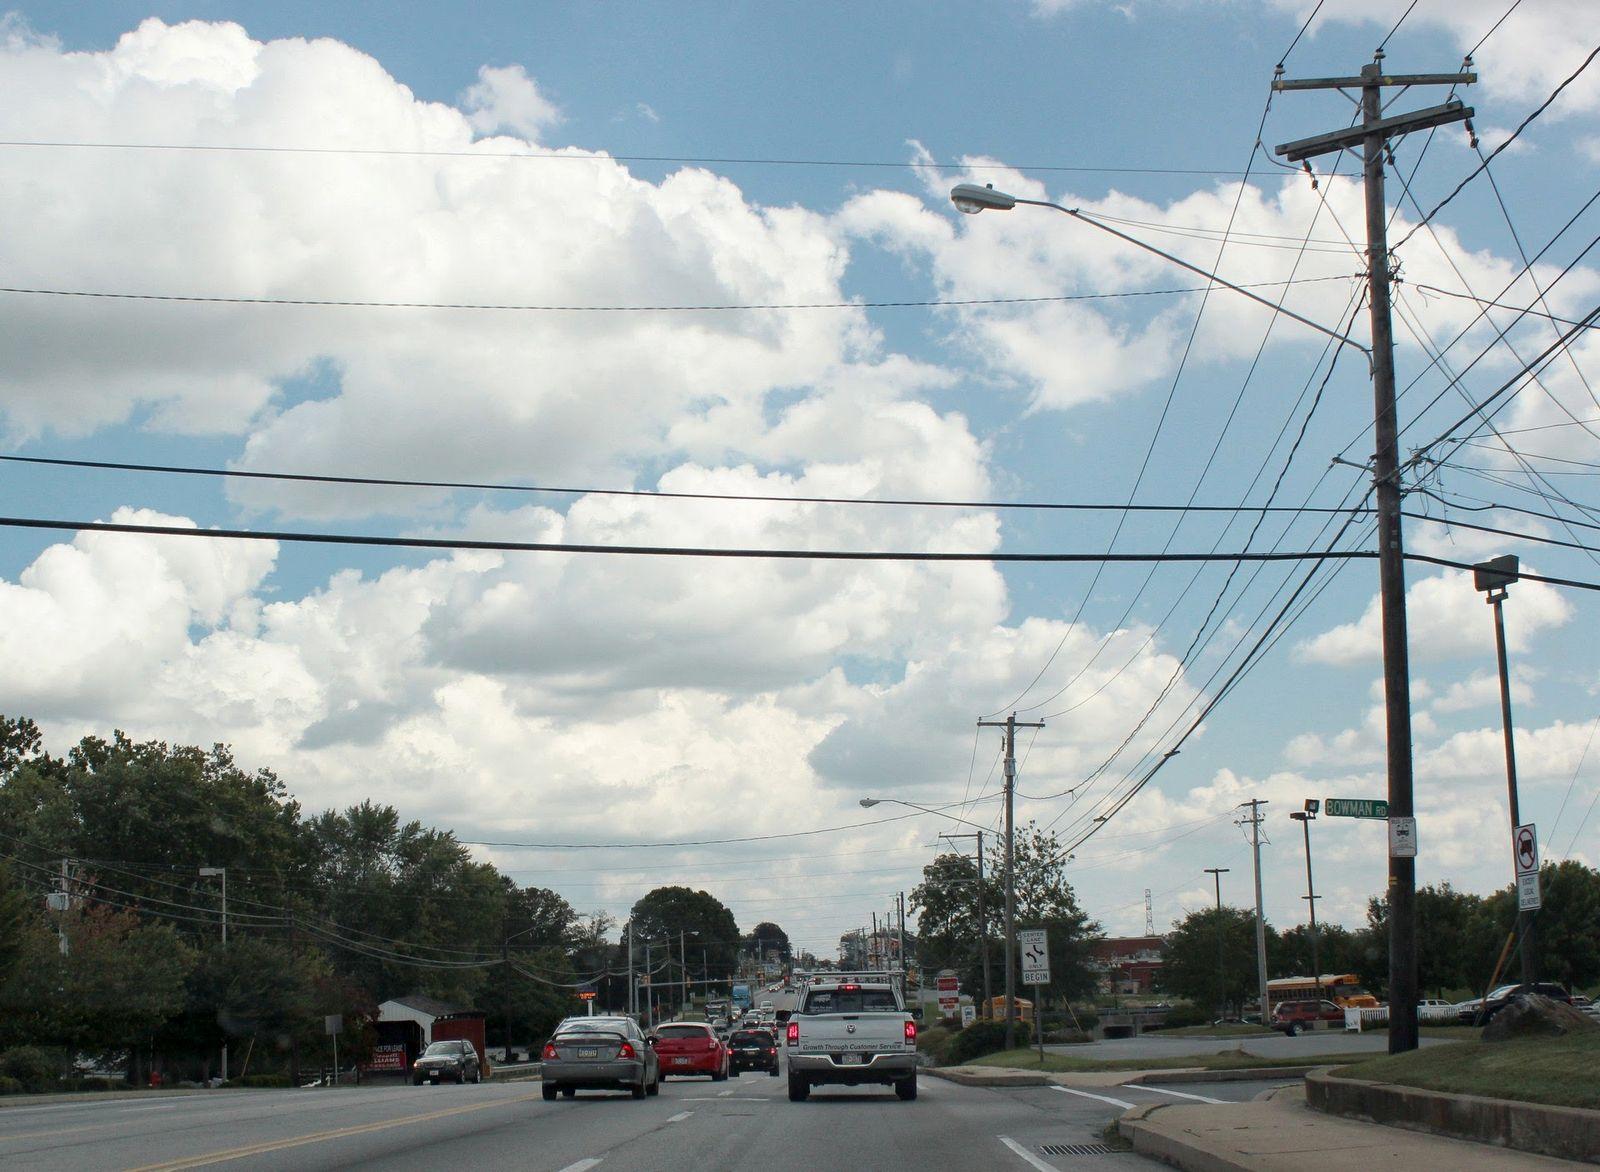 La carretera 30, arteria principal de la zona